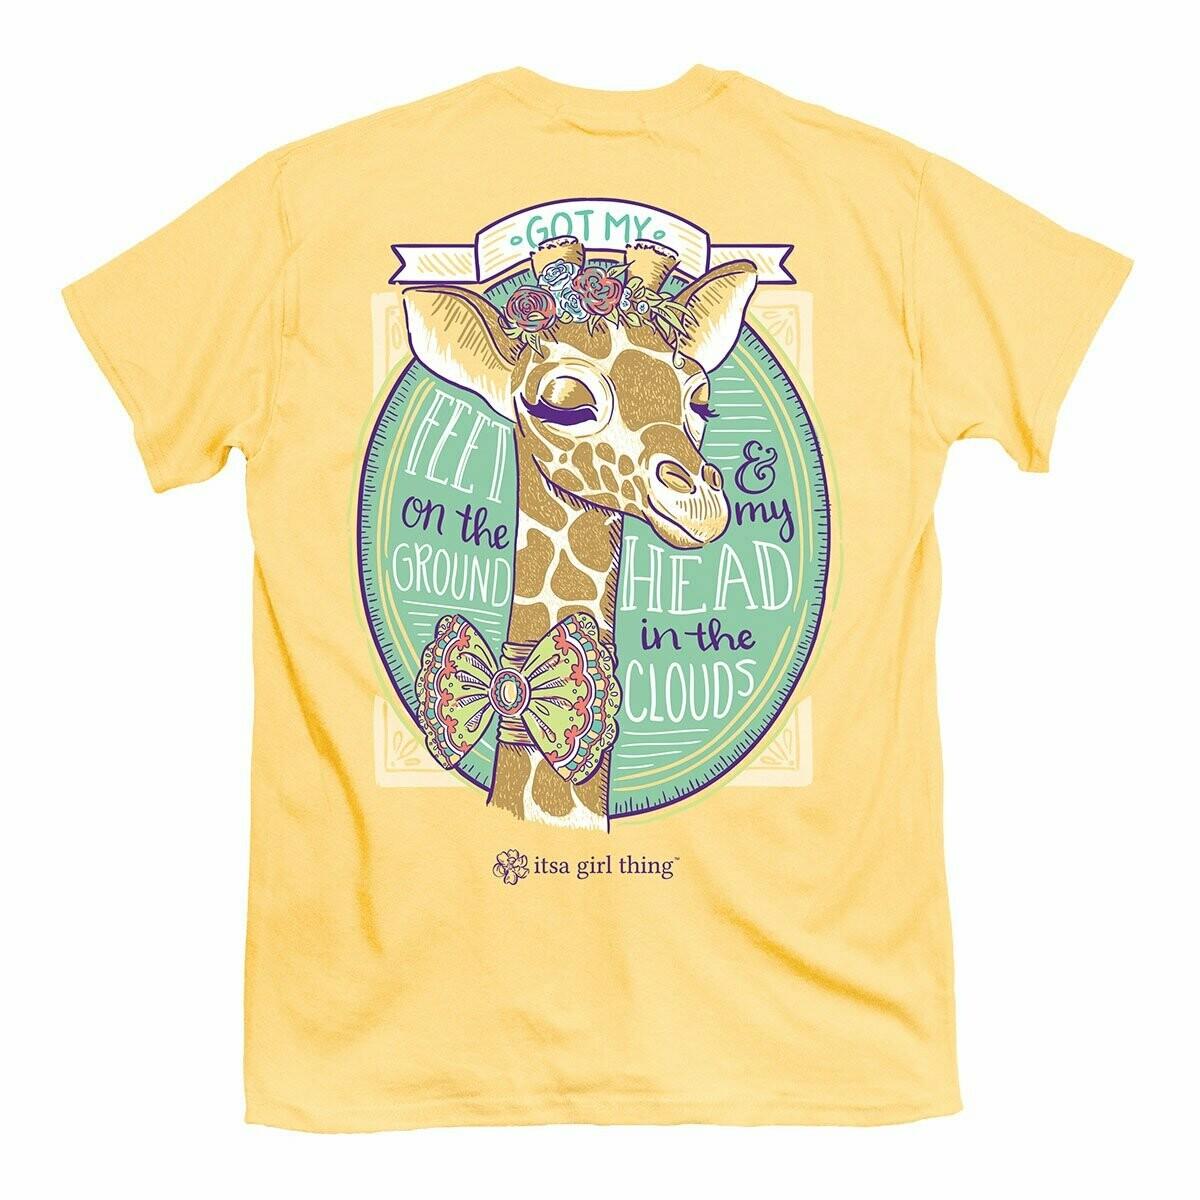 It's a girl thing- Giraffe Head in Clouds SS